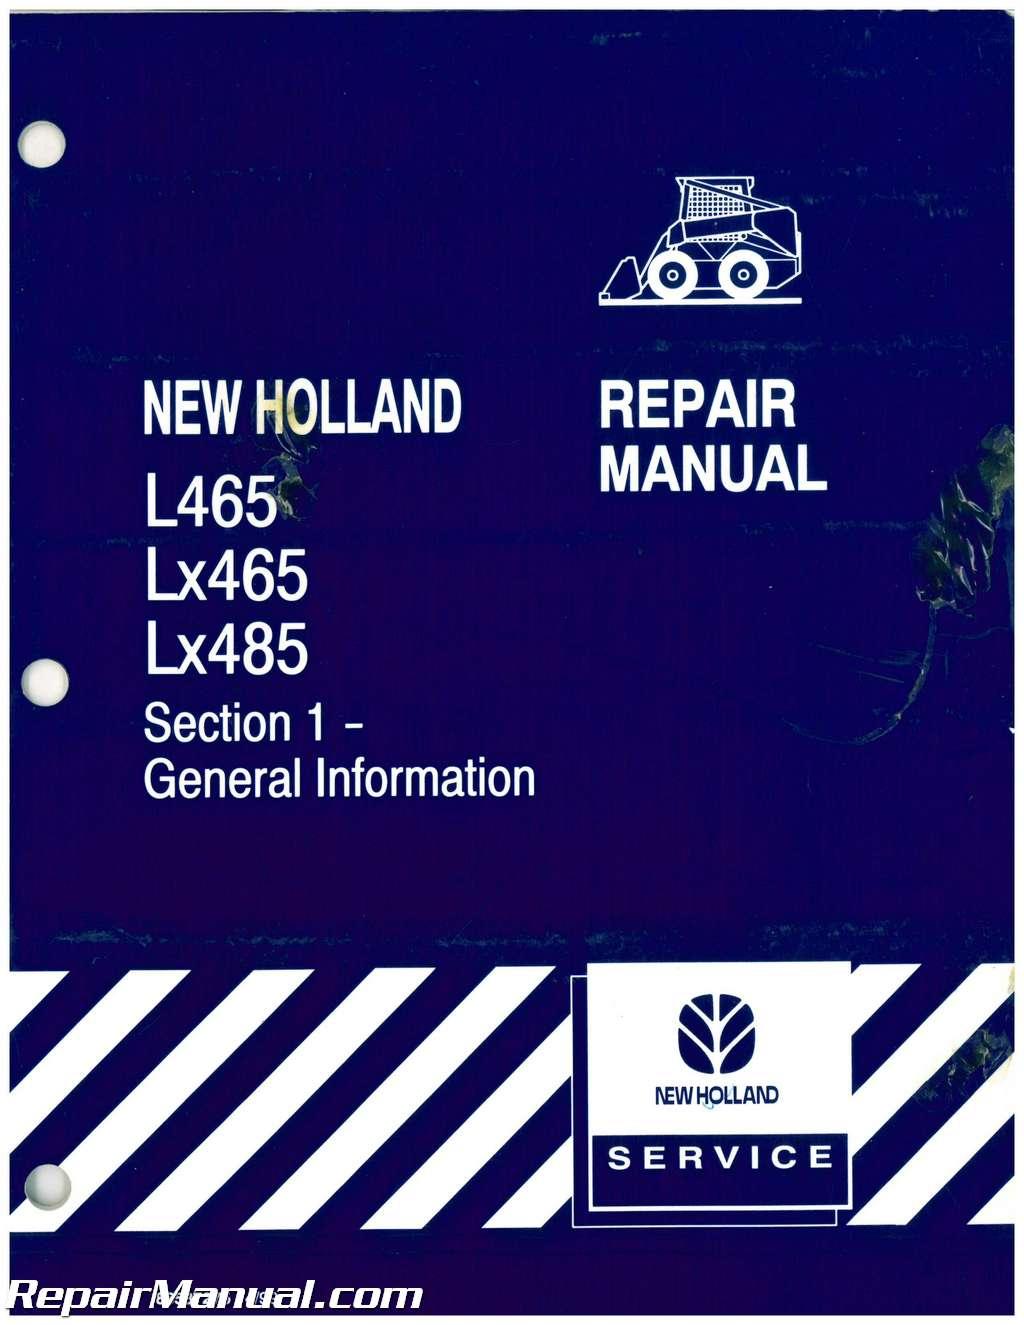 New holland l465 lx465 lx485 skid steer loader service repair.